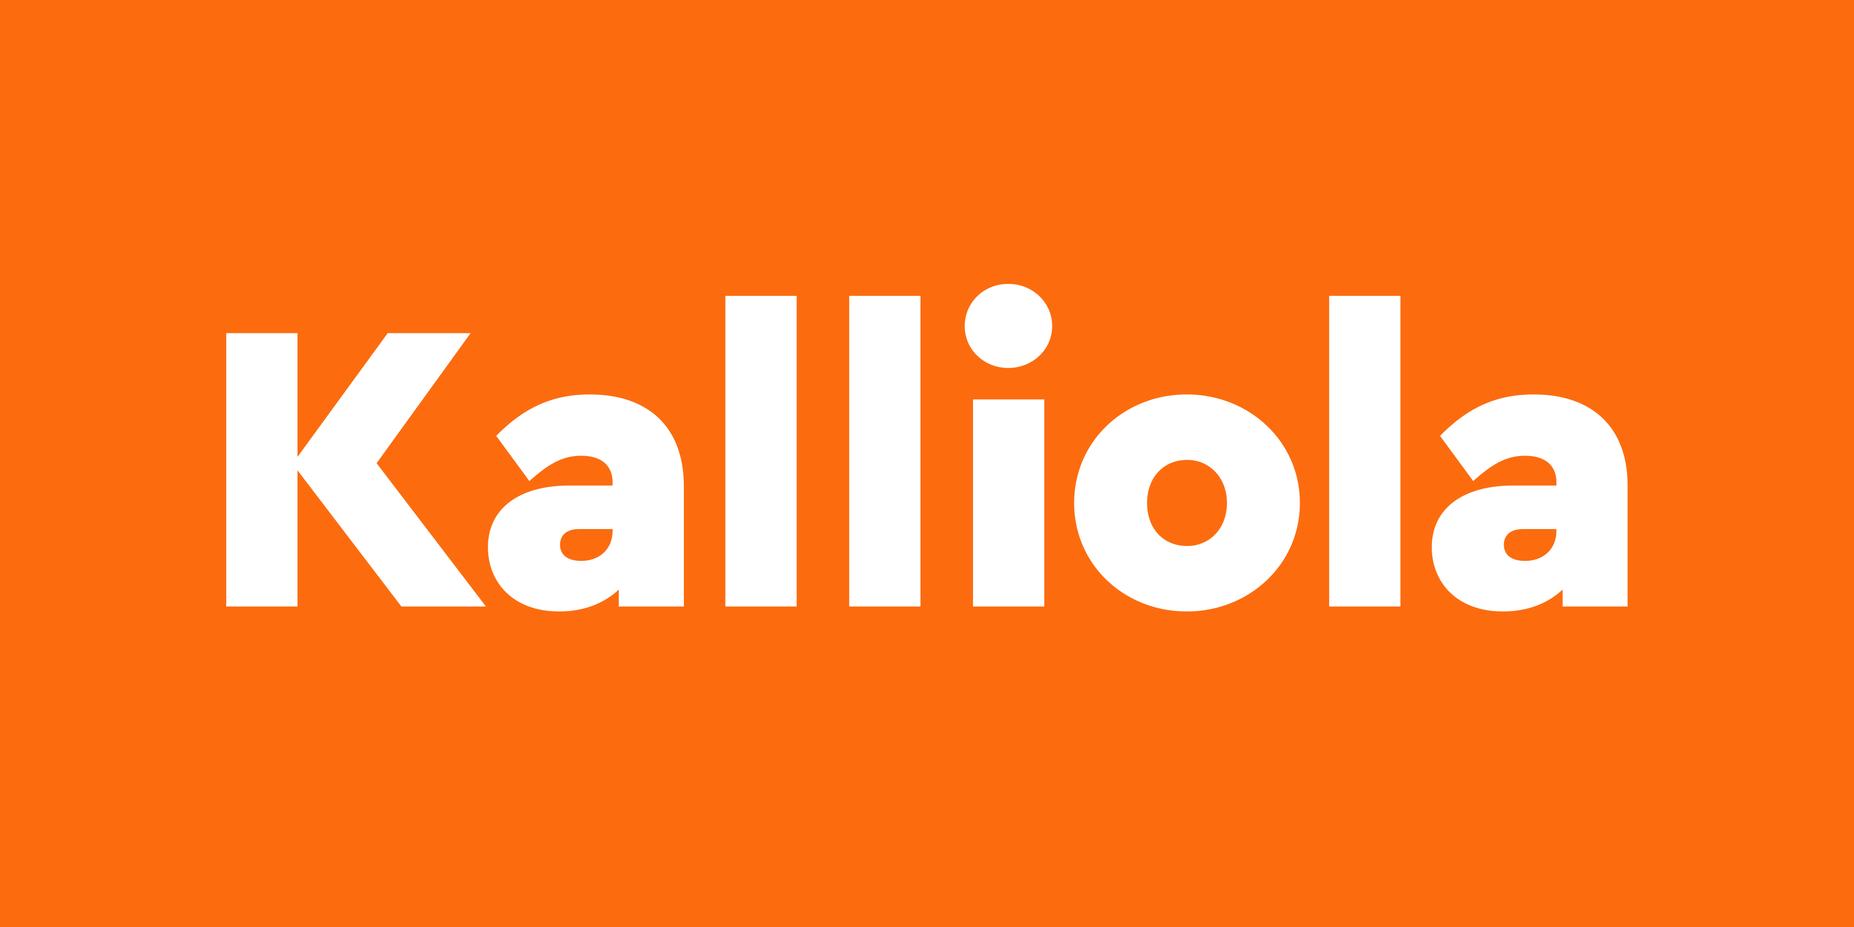 Kalliolan Setlementti ry-logo